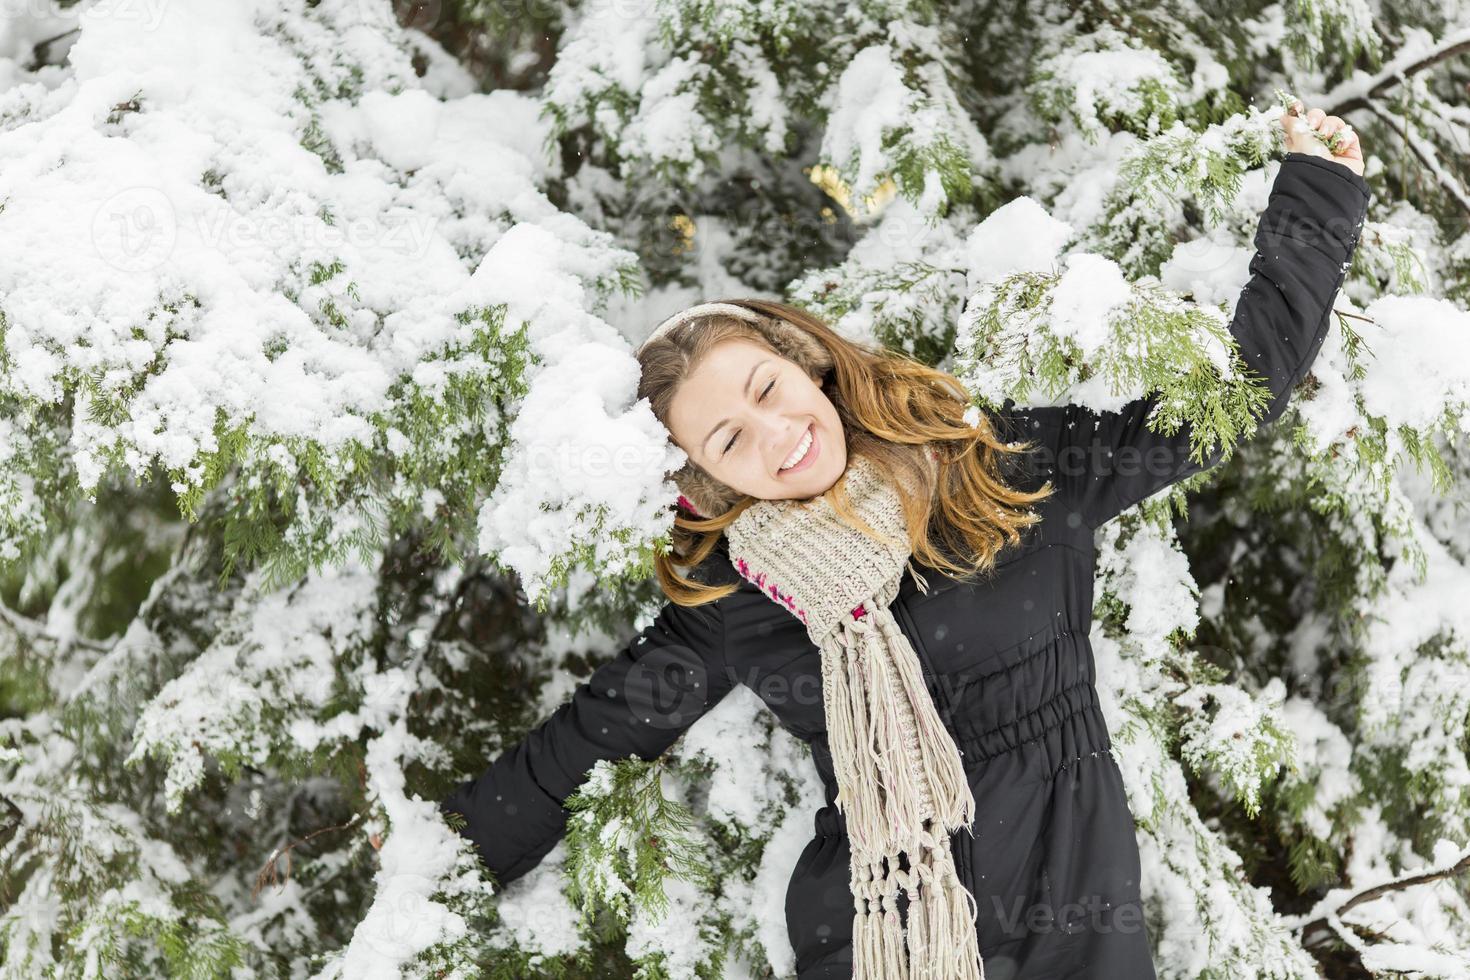 jovem no inverno foto